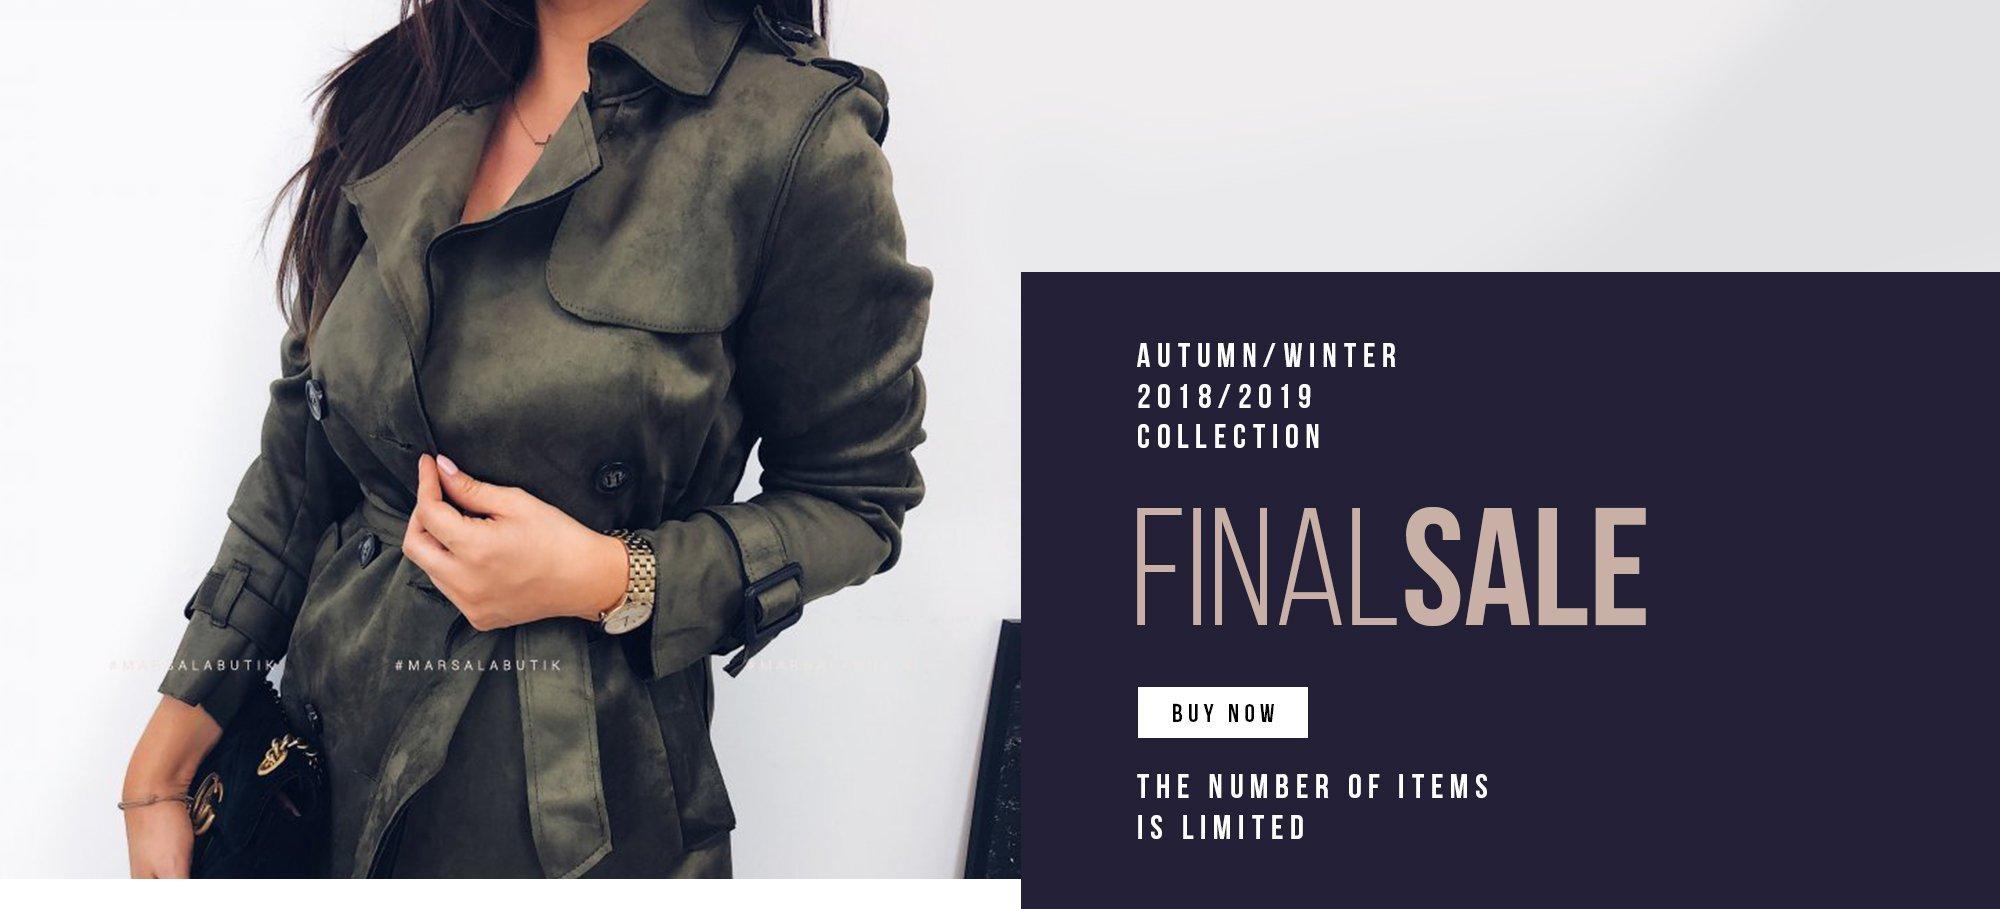 /thumbs/autoxauto/2019-02::1551187844-1-final-sale.jpg